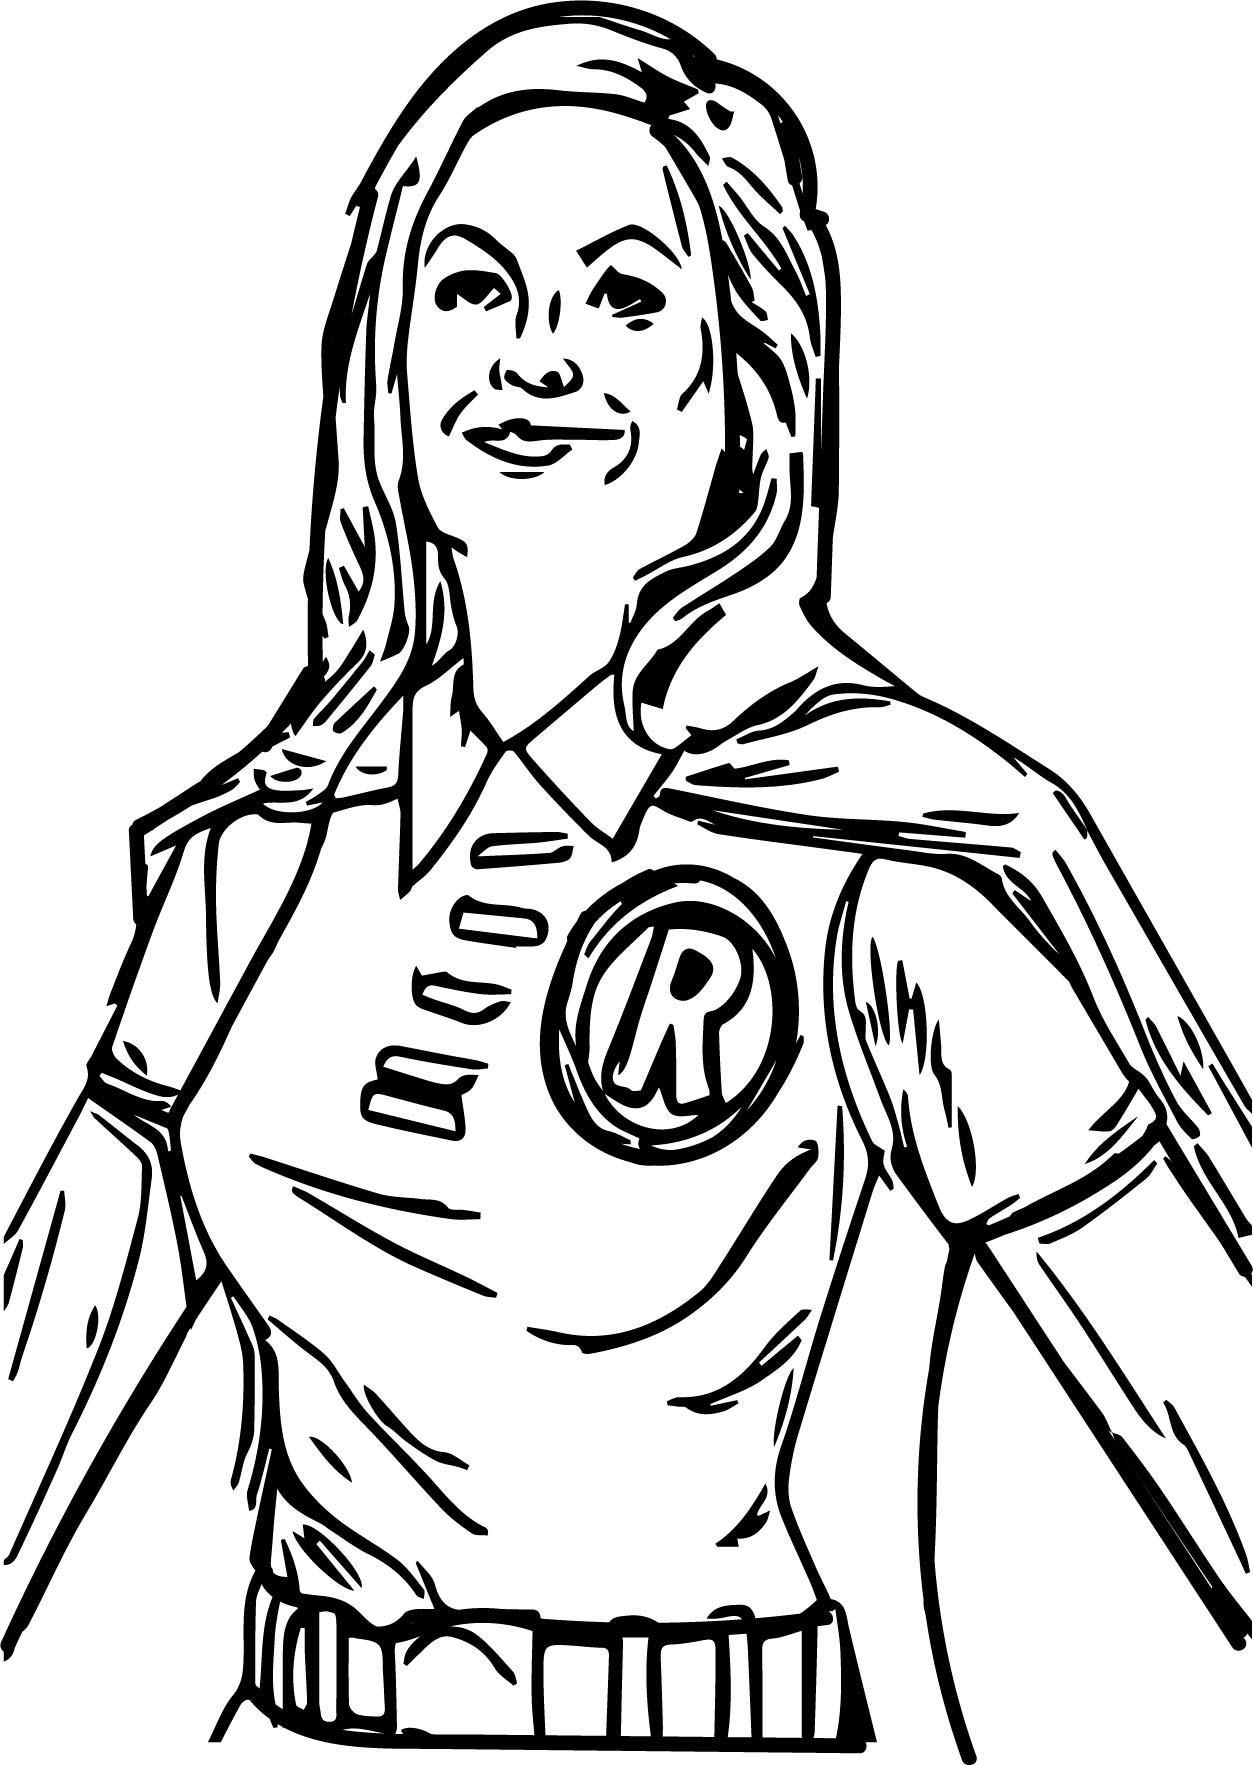 Superheroes Robin Girl Super Hero Coloring Page